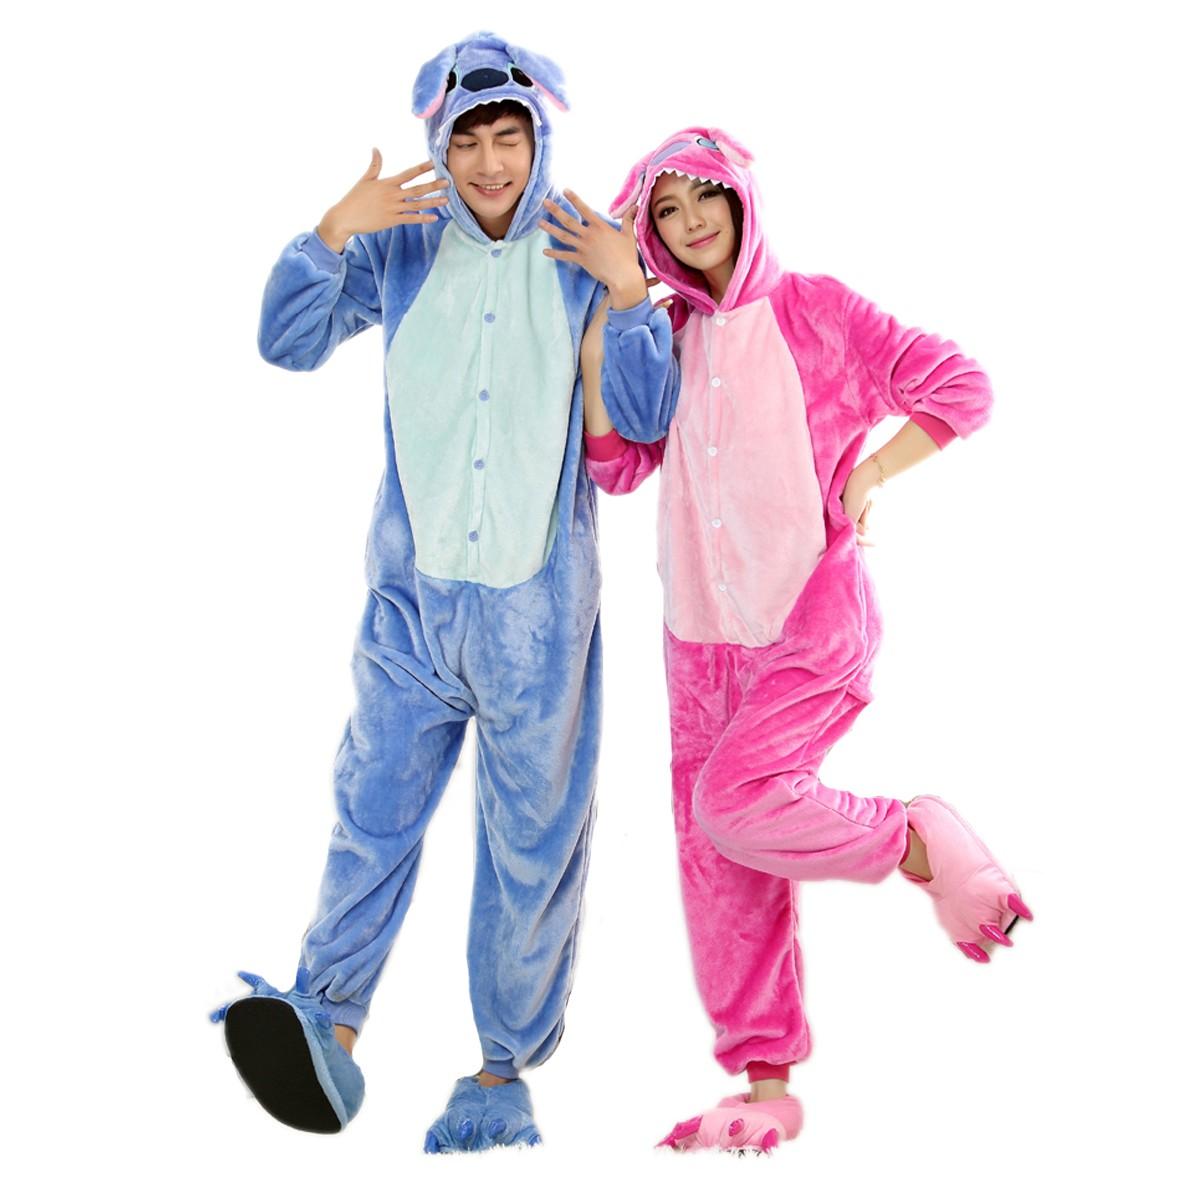 95b6f01d114f Stitch and Angel Onesie for Adult Kigurumi Pajama Disney Lilo   Stitch  Party Costumes